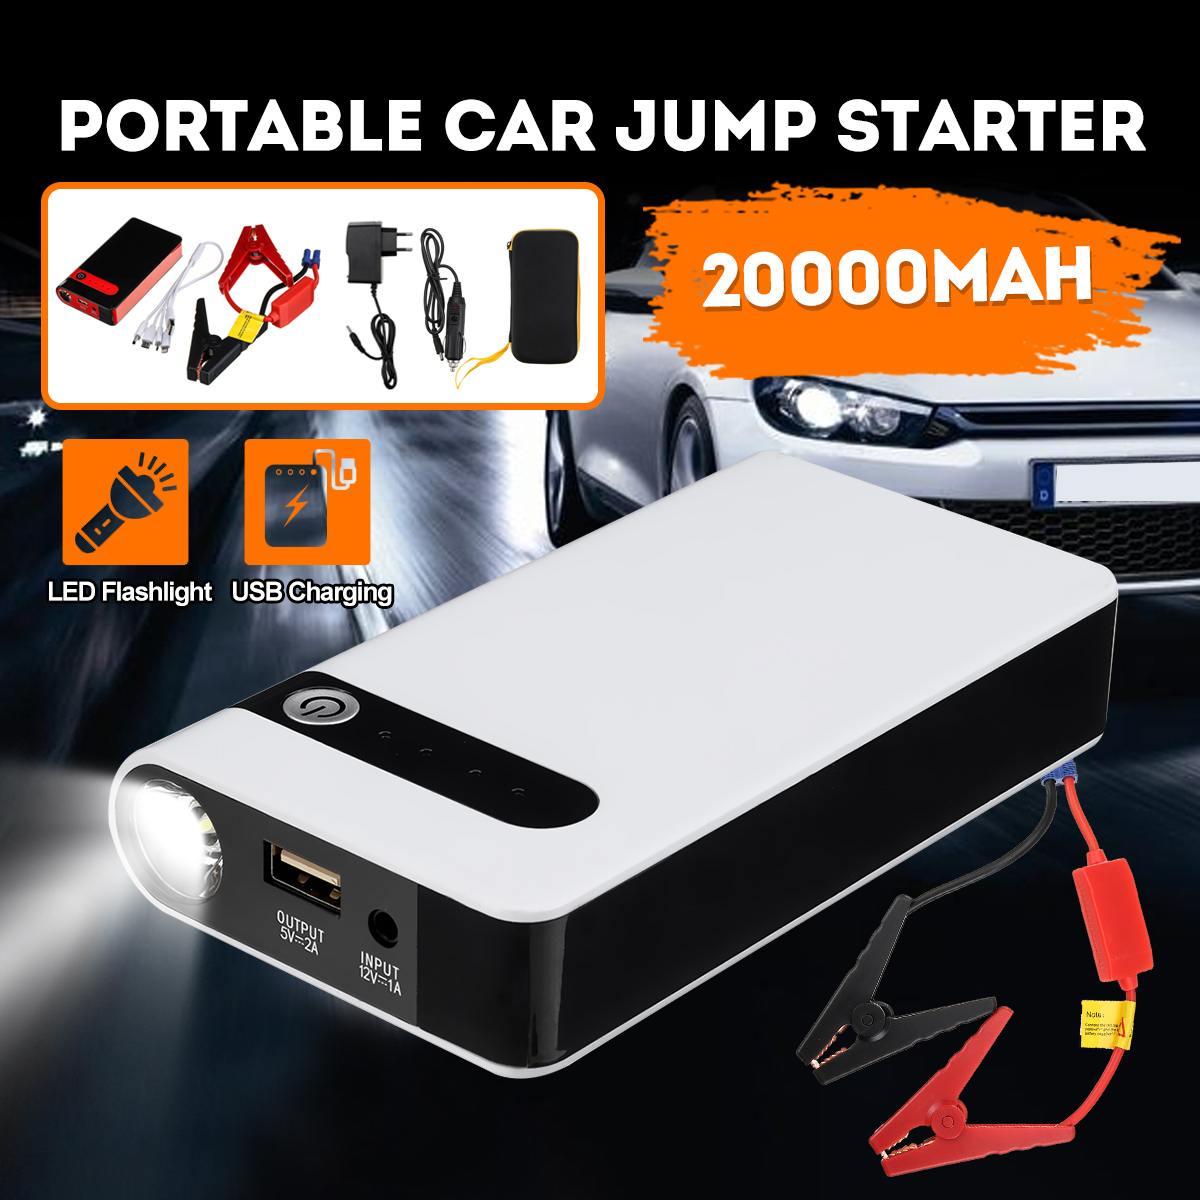 12V 20000mAh Car JUMP Starter Booster จัมเปอร์ USB Power Bank Battery Charger ฉุกเฉินราคาเริ่มต้นที่อุปกรณ์